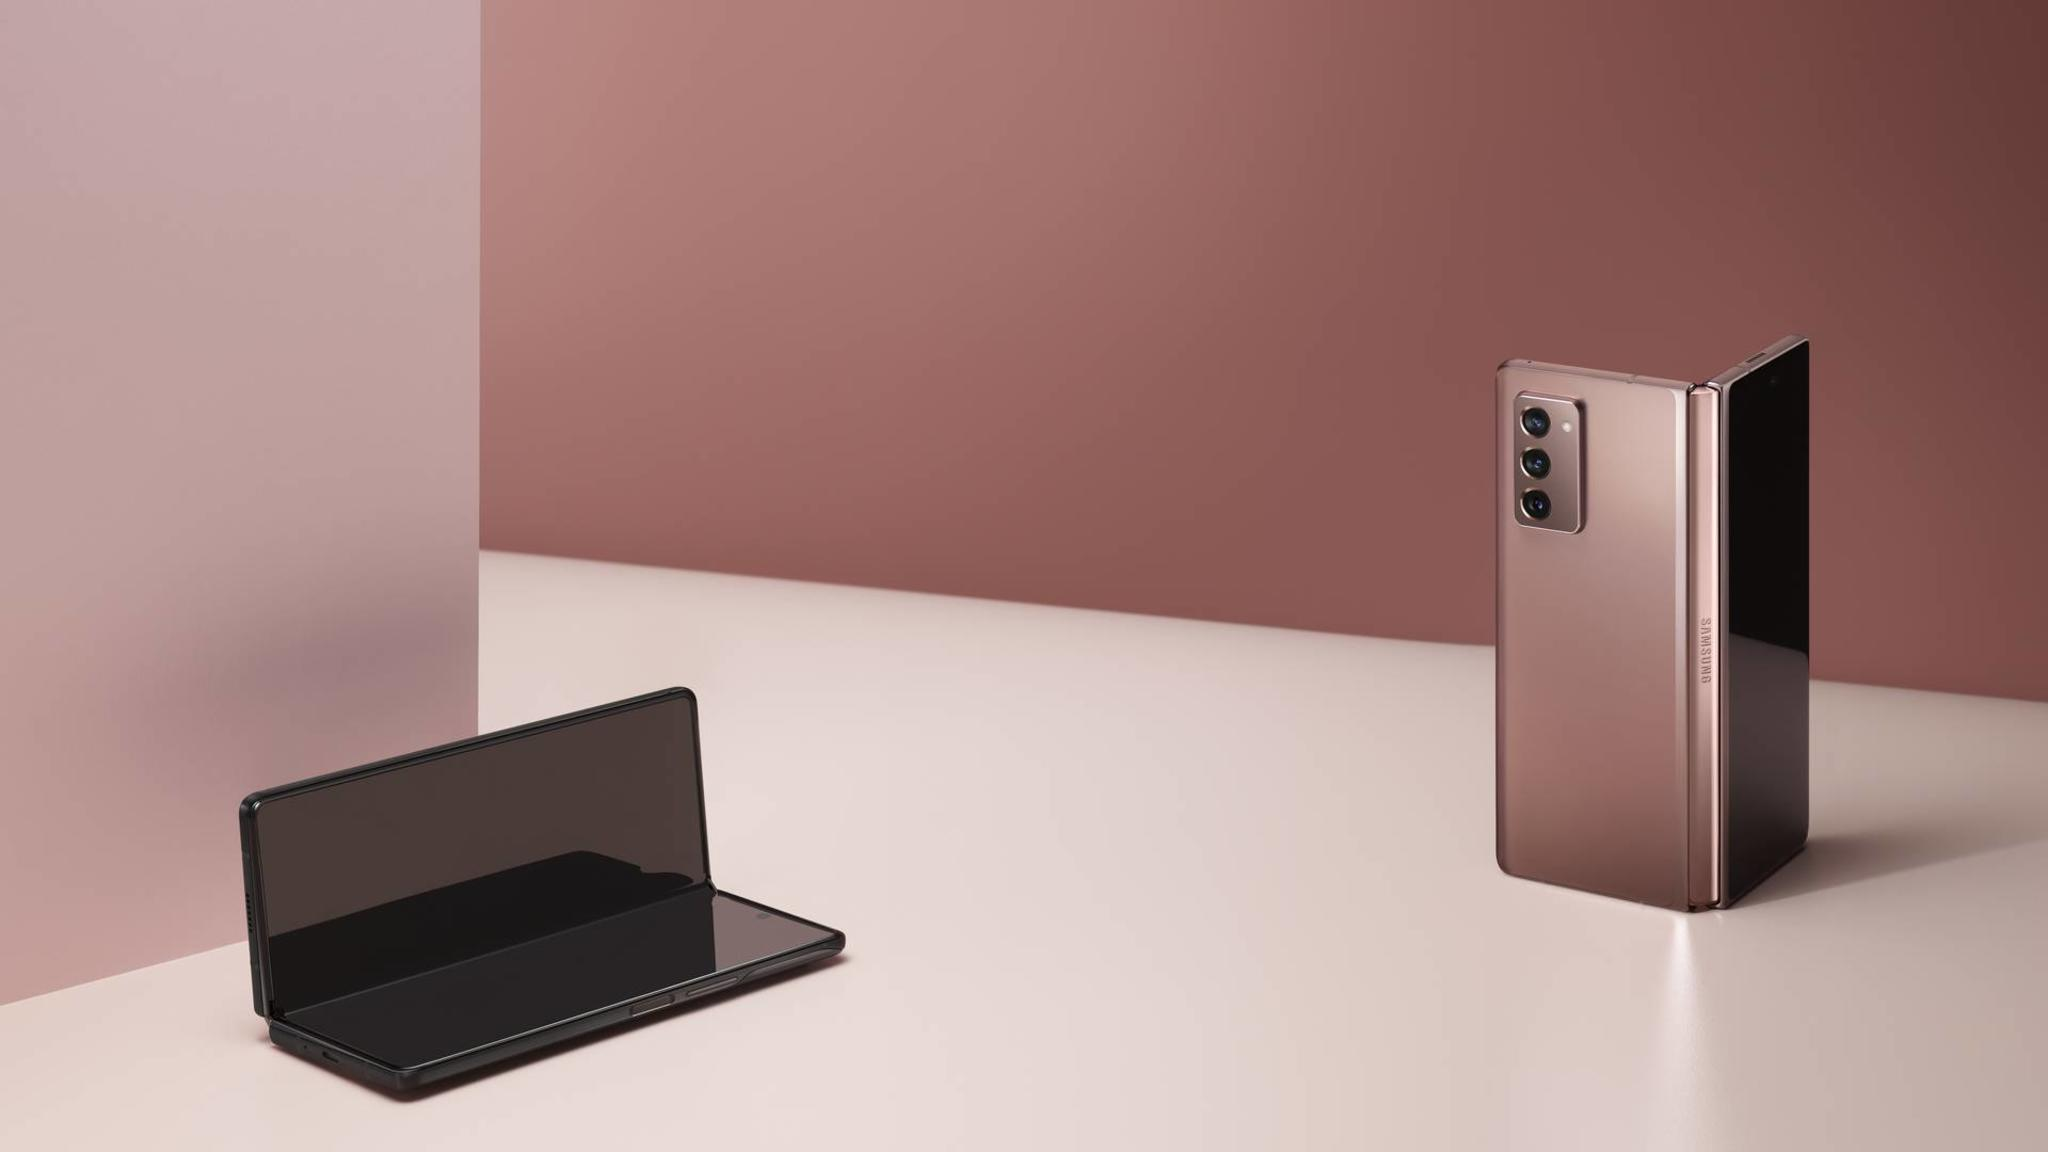 Samsung-Galaxy-Z-Fold-2-Lifestyle-01